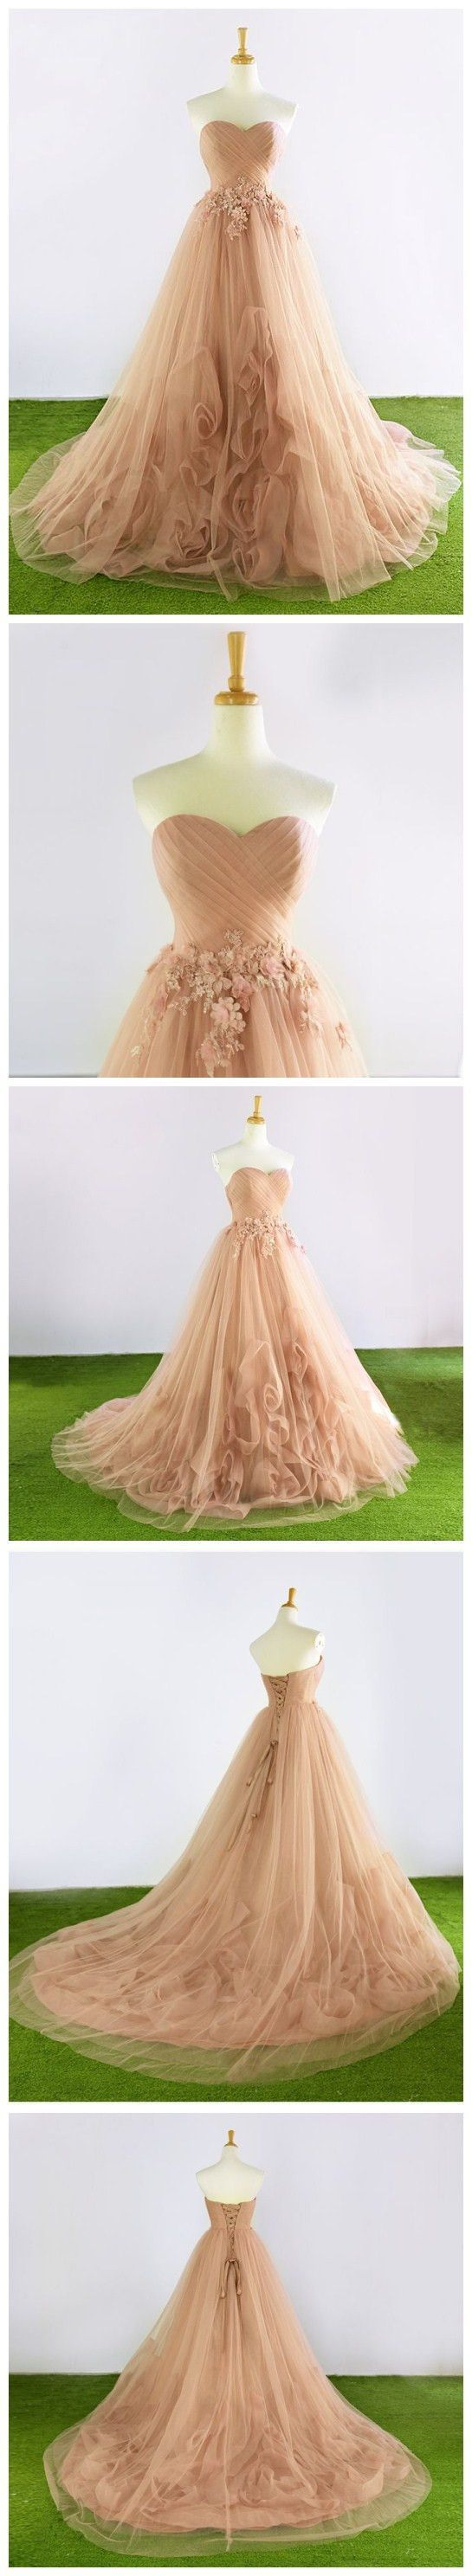 Graduation Dress,Sexy Prom Dress,2019Formal Party Dress